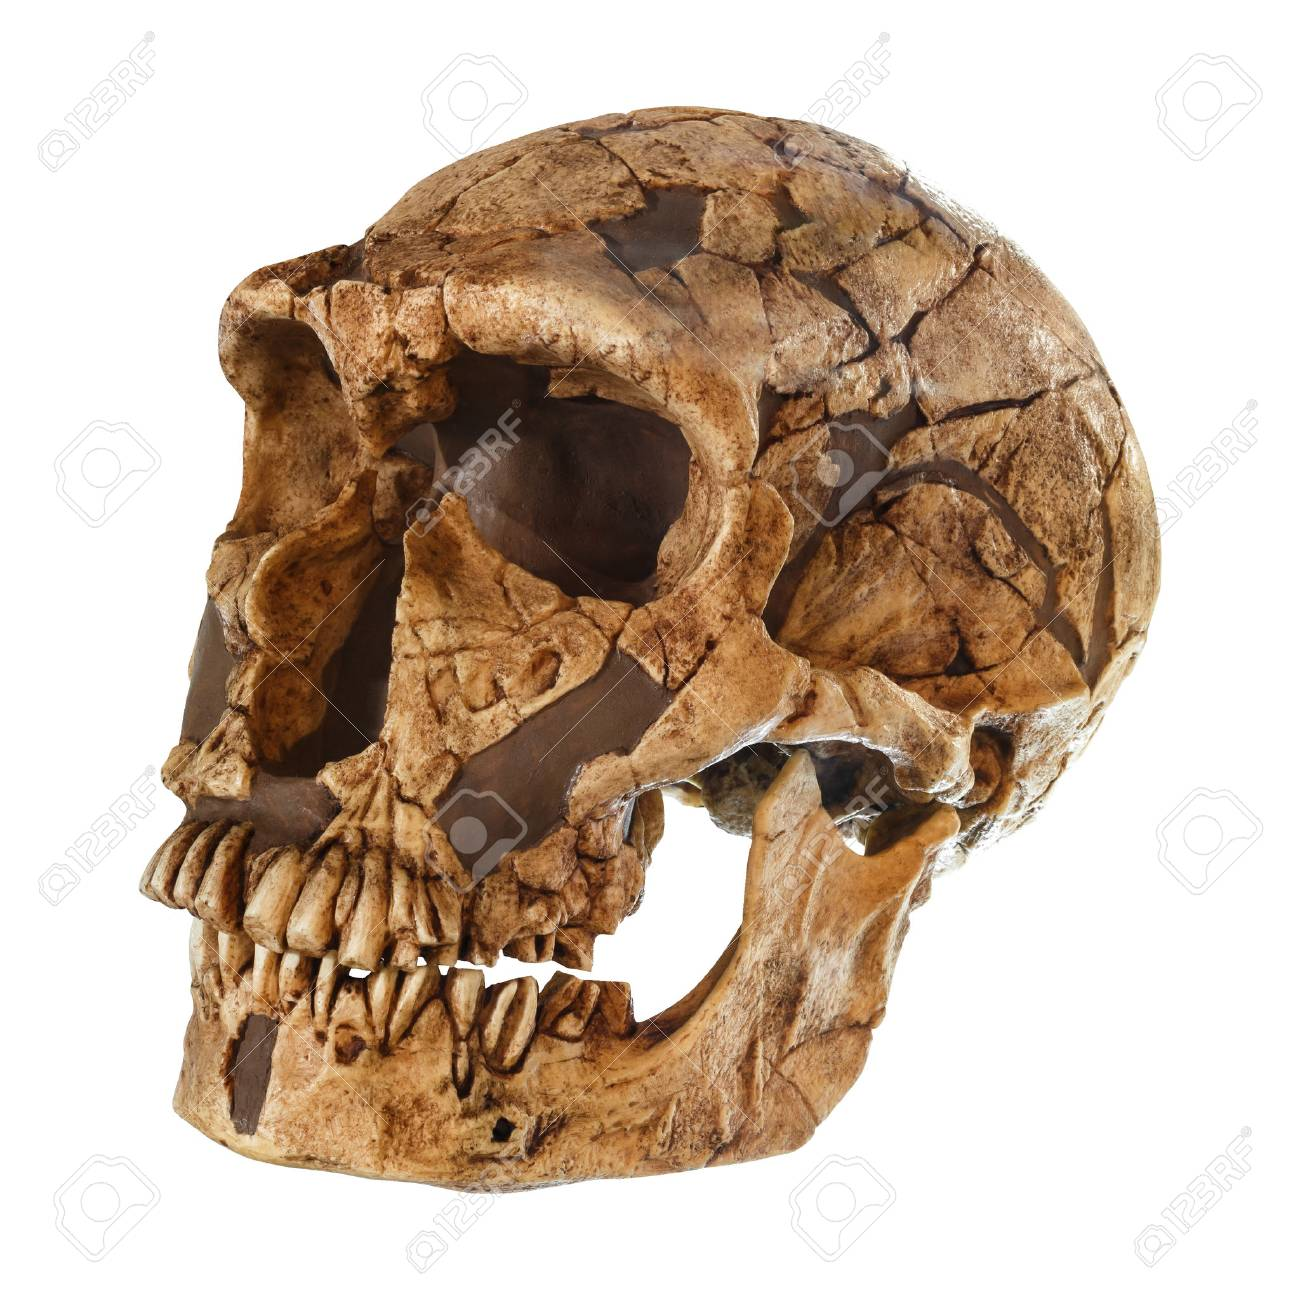 Homo neanderthalensis skull . ( La Ferrassie ) . Dated to 50,000 years ago . Discovered in 1909 in La Ferrassie , France . - 87491770